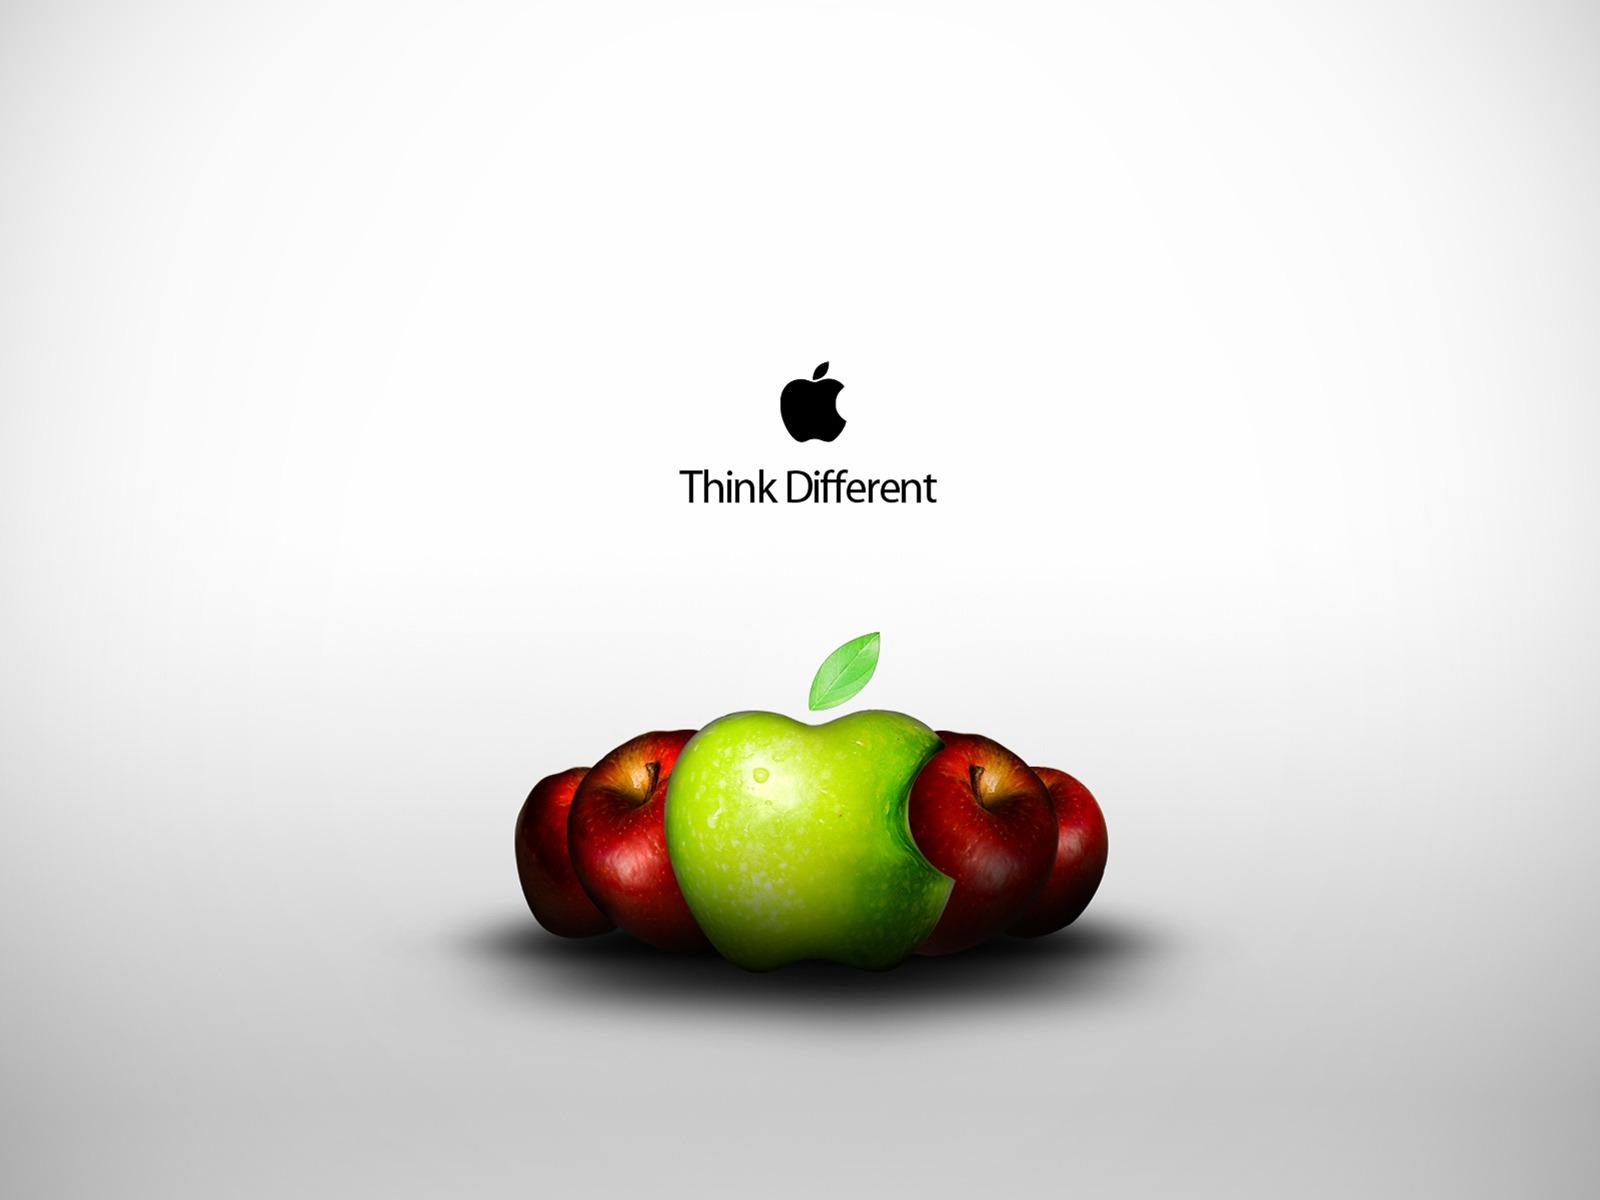 apple think different wallpaper apple computers wallpapers apple room ternopil apple room mug house inn bewdley